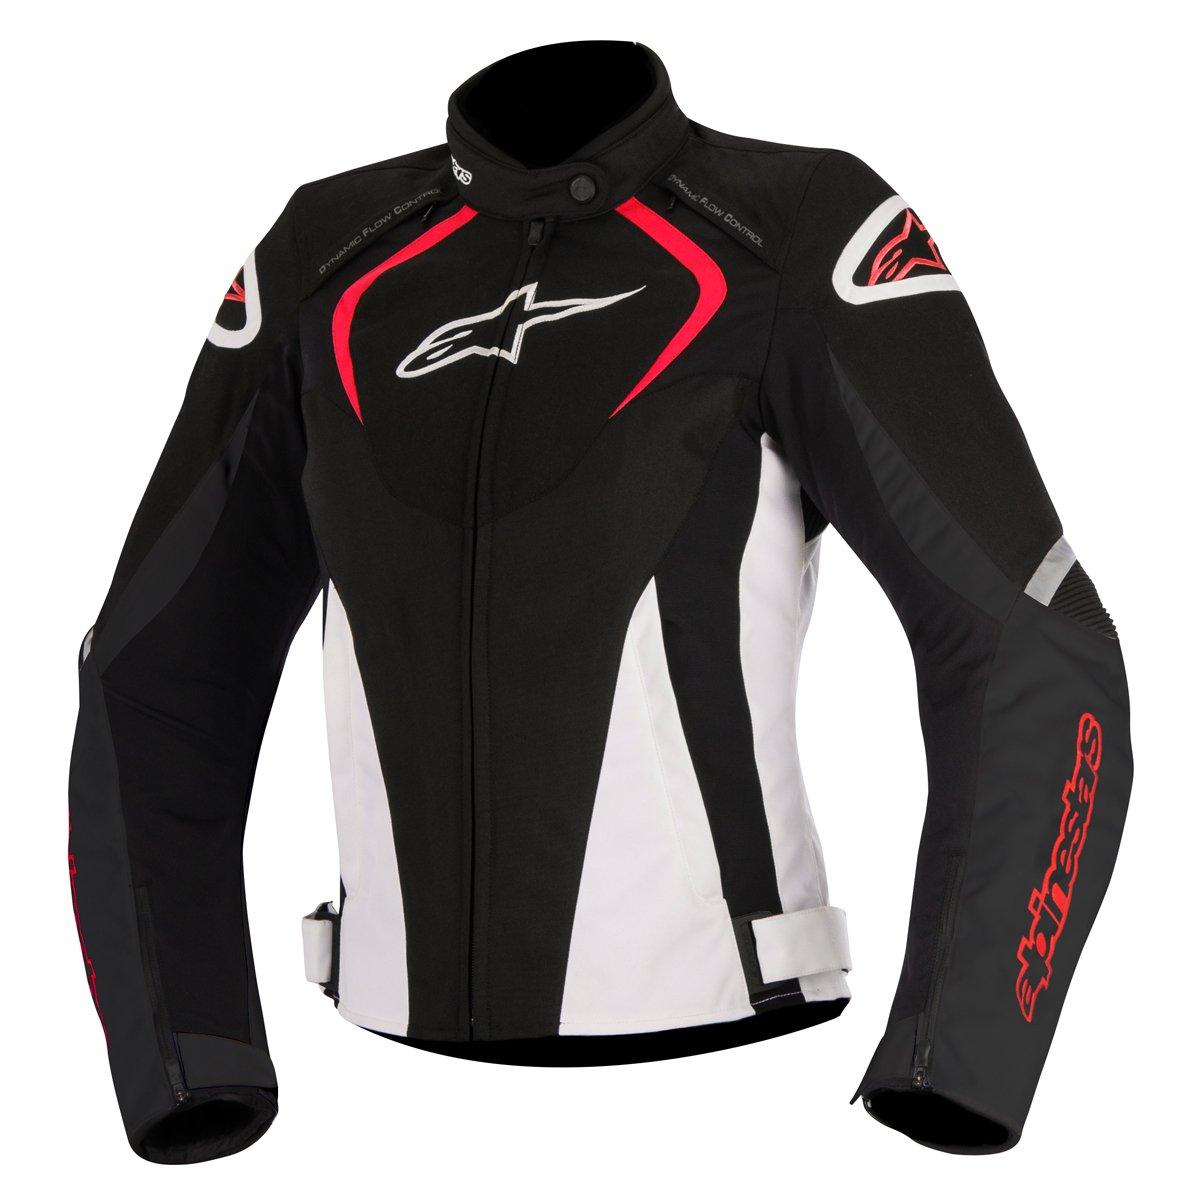 Alpinestars Veste moto Stella T-JAWS Lady 2017/ m, nero-bianco-rosso 123